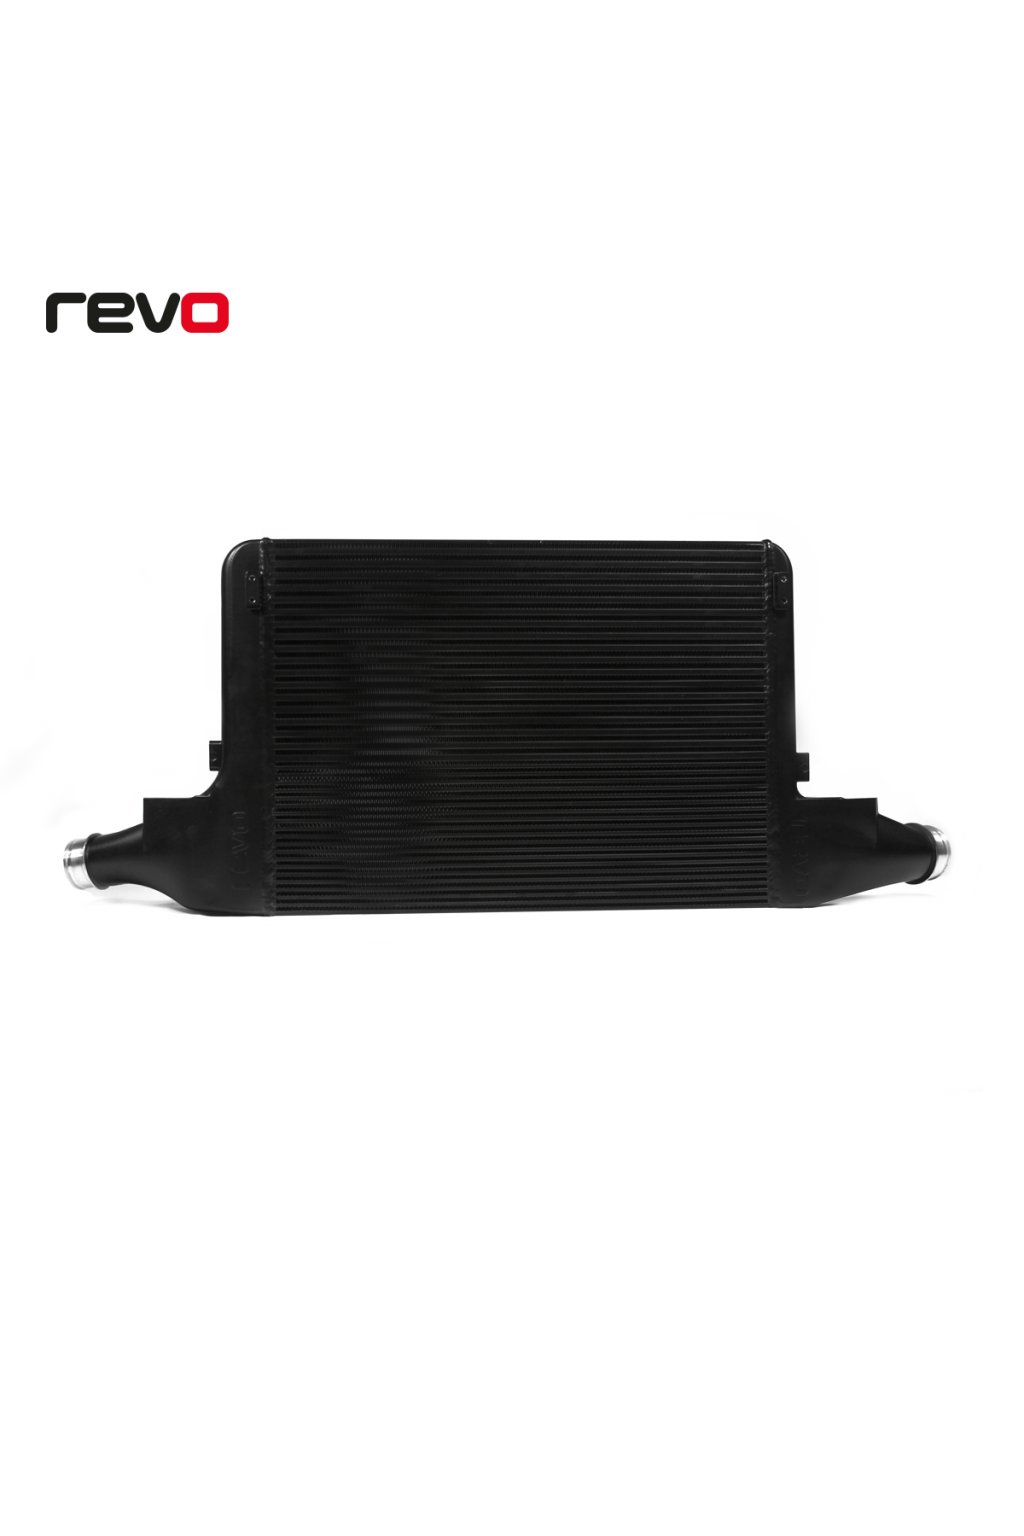 Revo Audi A4/A5/Allroad 2.0T B9 intercooler